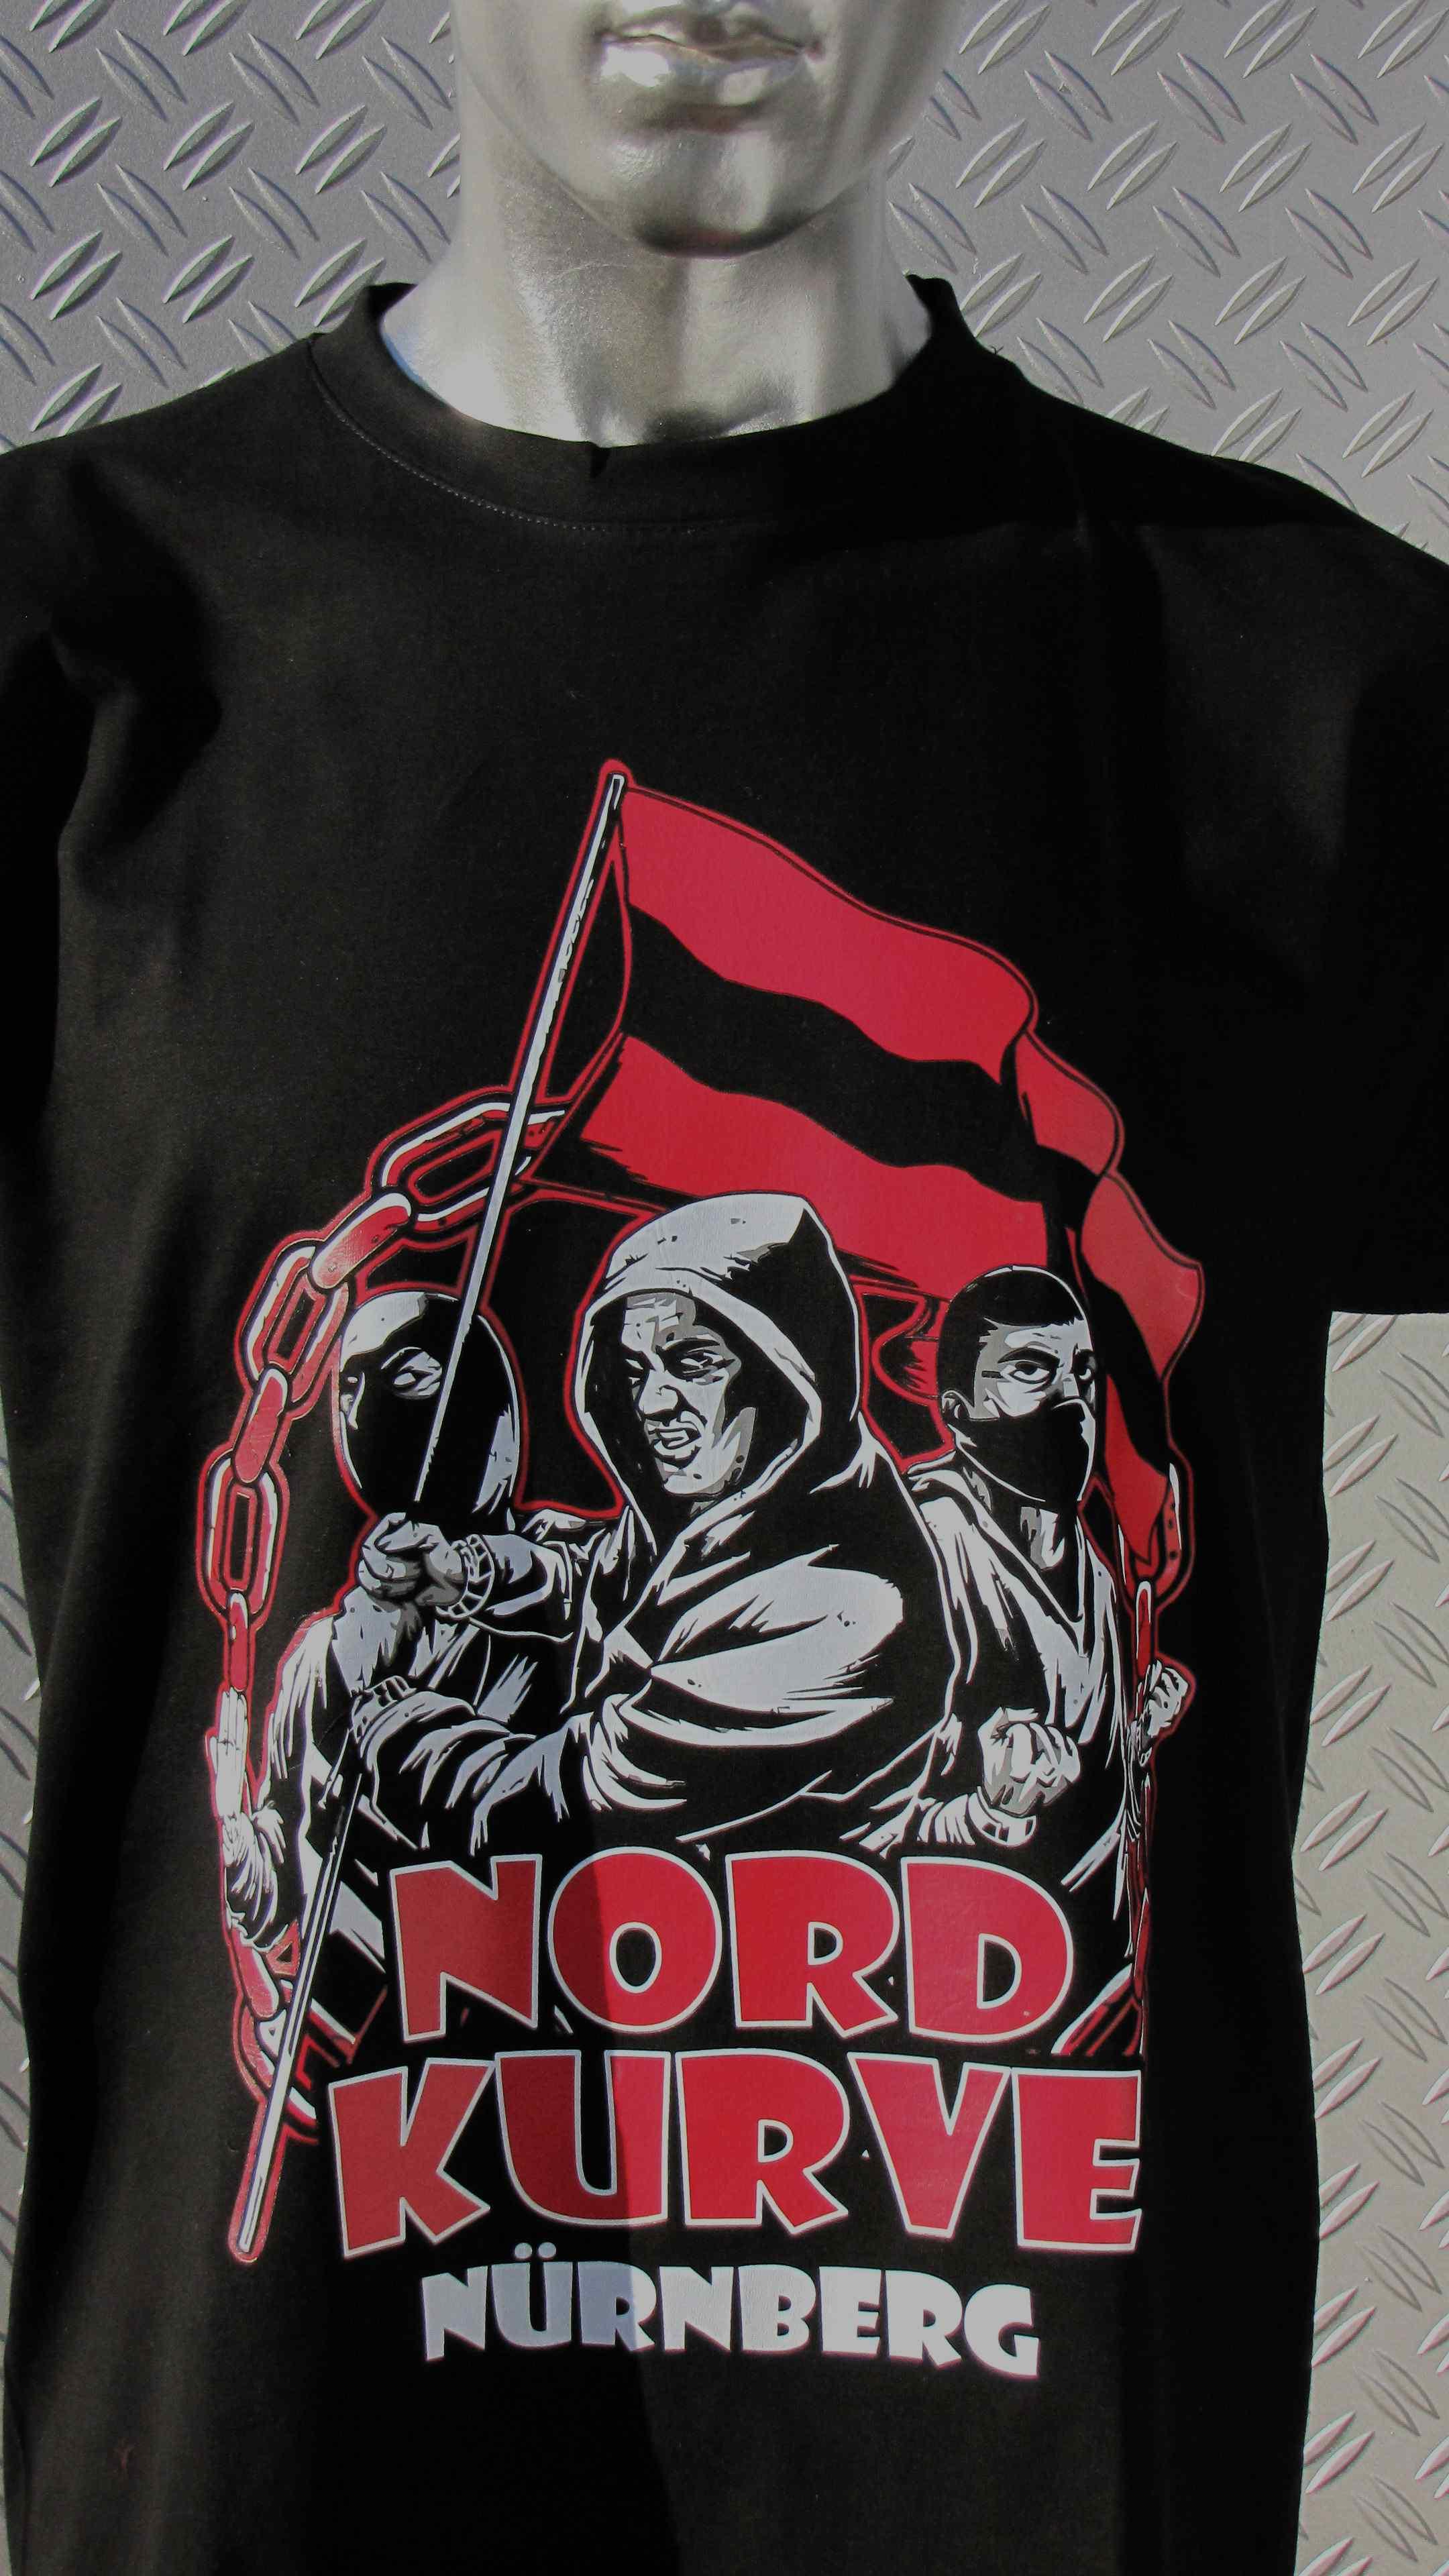 T-Shirt einseitig bedruckt - Nordkurve Nürnberg Fahnenterror